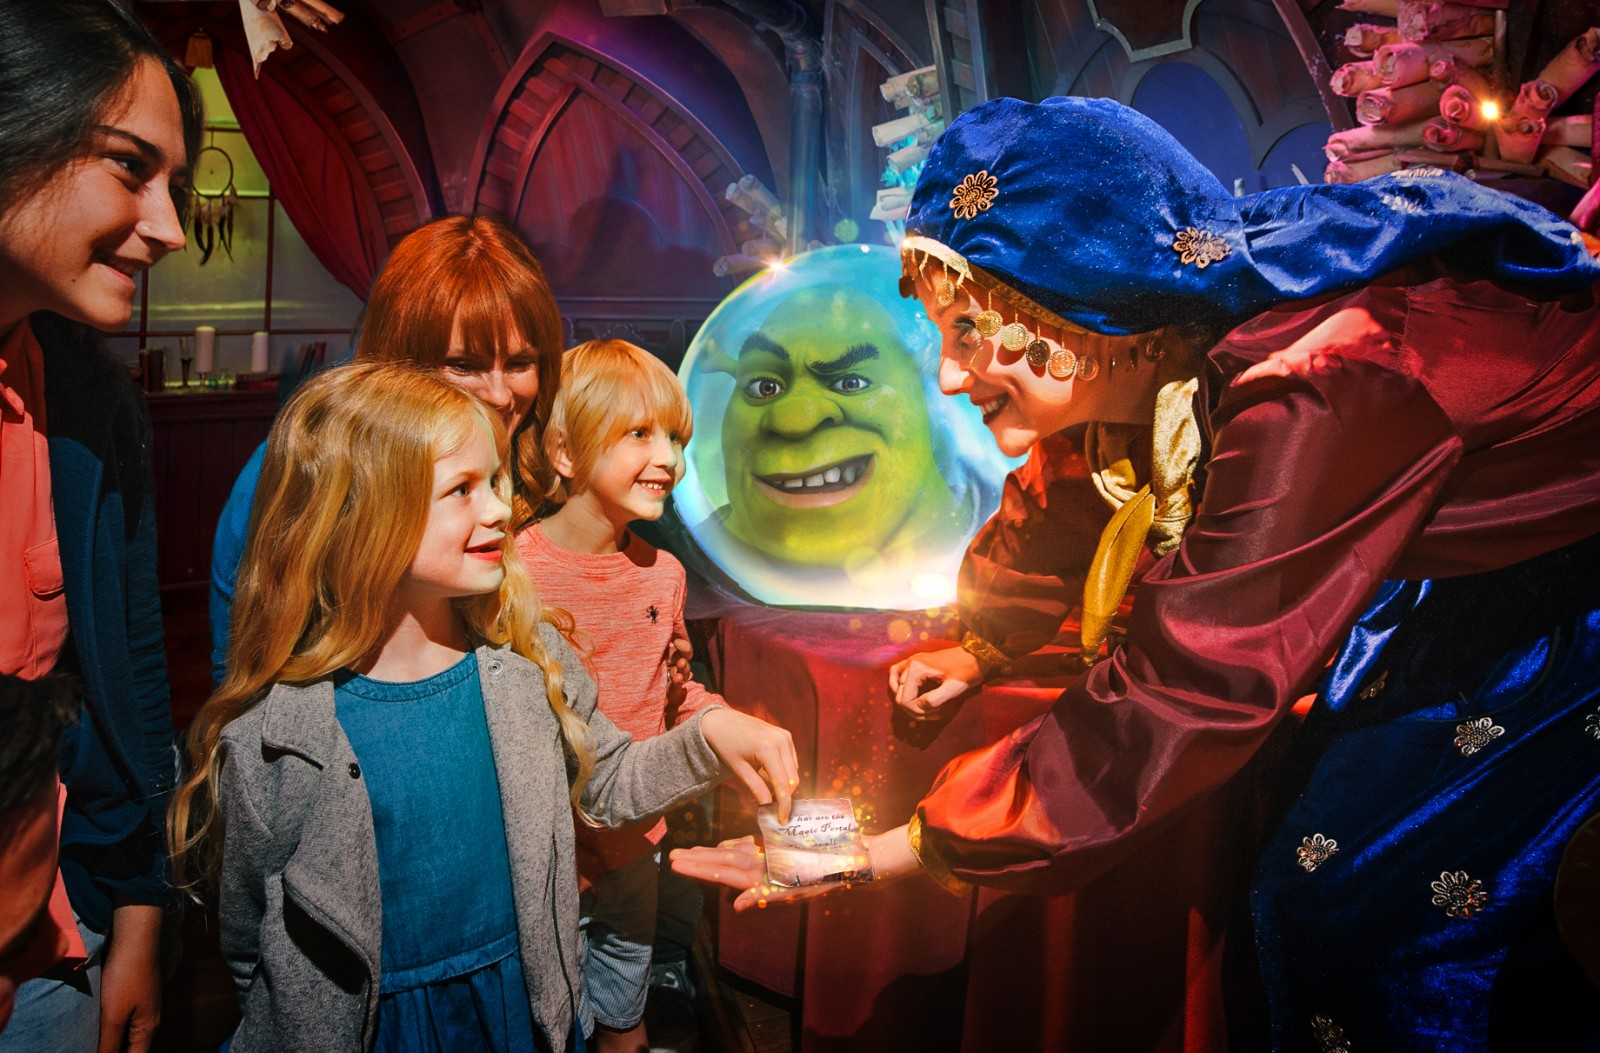 Library images of Shrek's Adventure London. © Mikael Buck / Shrek's Adventure